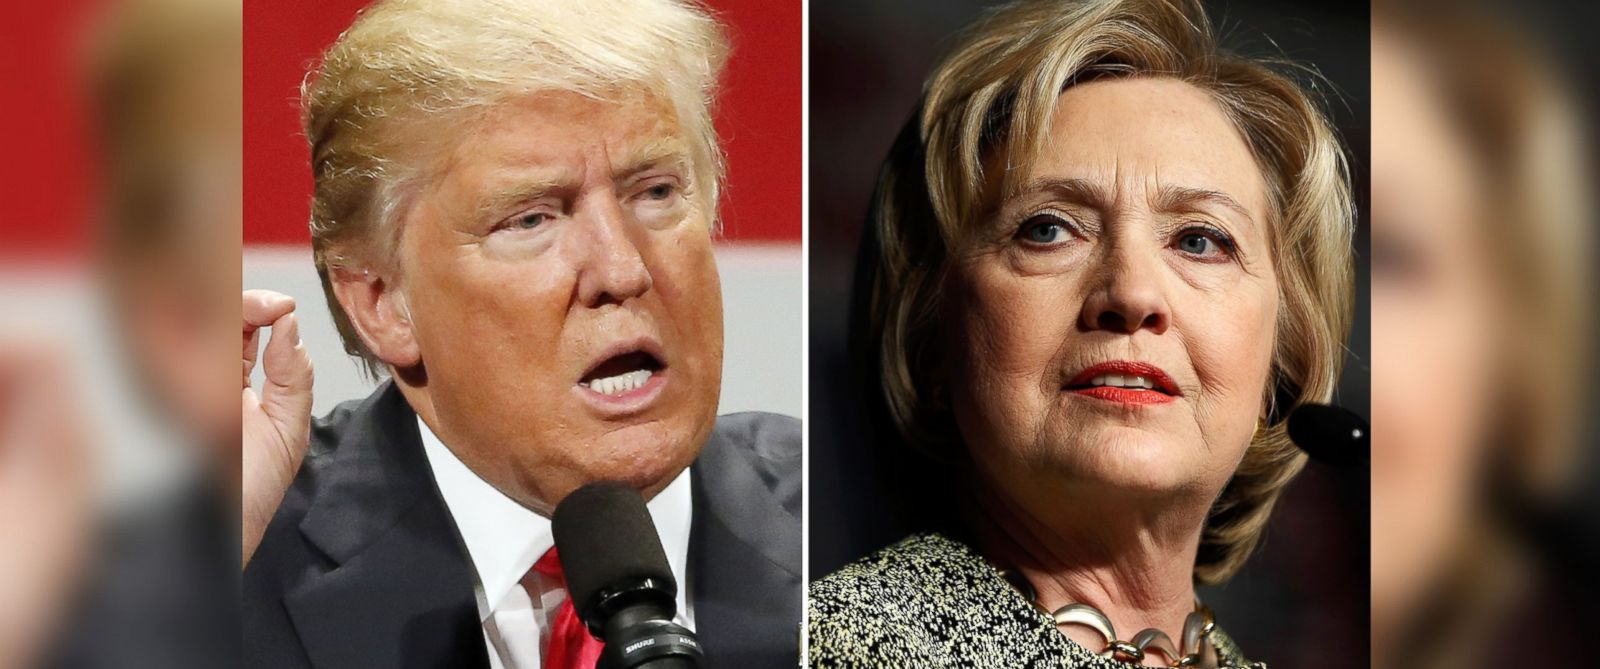 PHOTO: Donald Trump speaks in Milwaukee on April 4, 2016 and Hillary Clinton speaks in Philadelphia on April 6, 2016.